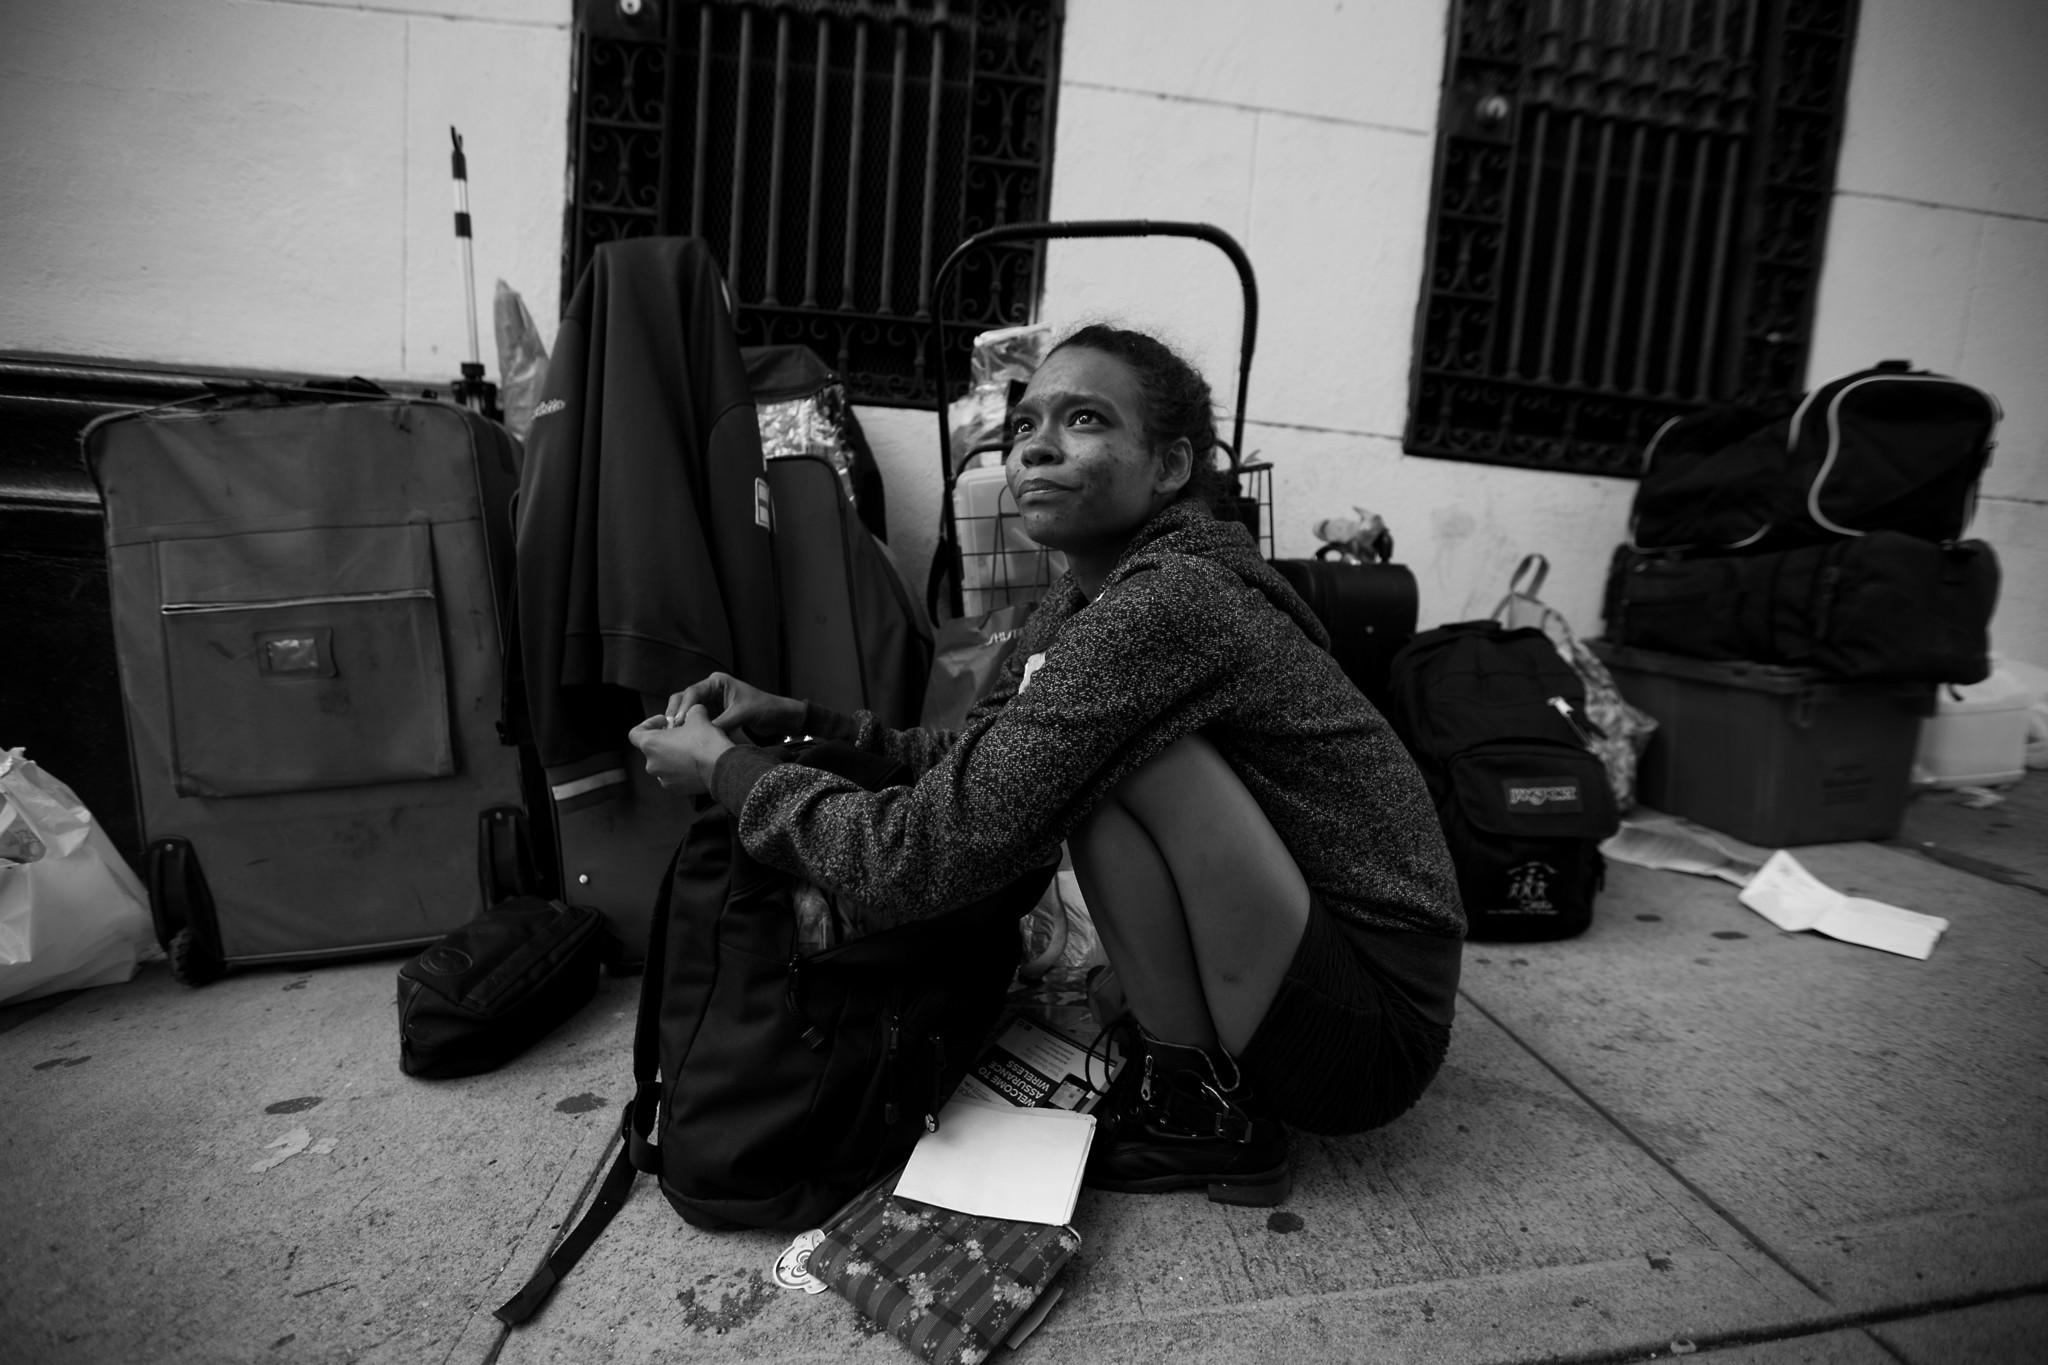 LOS ANGELES, CA NOVEMBER 17, 2017: Shirley Velastegui, (CQ), 22, sits next to her luggage near MacAr